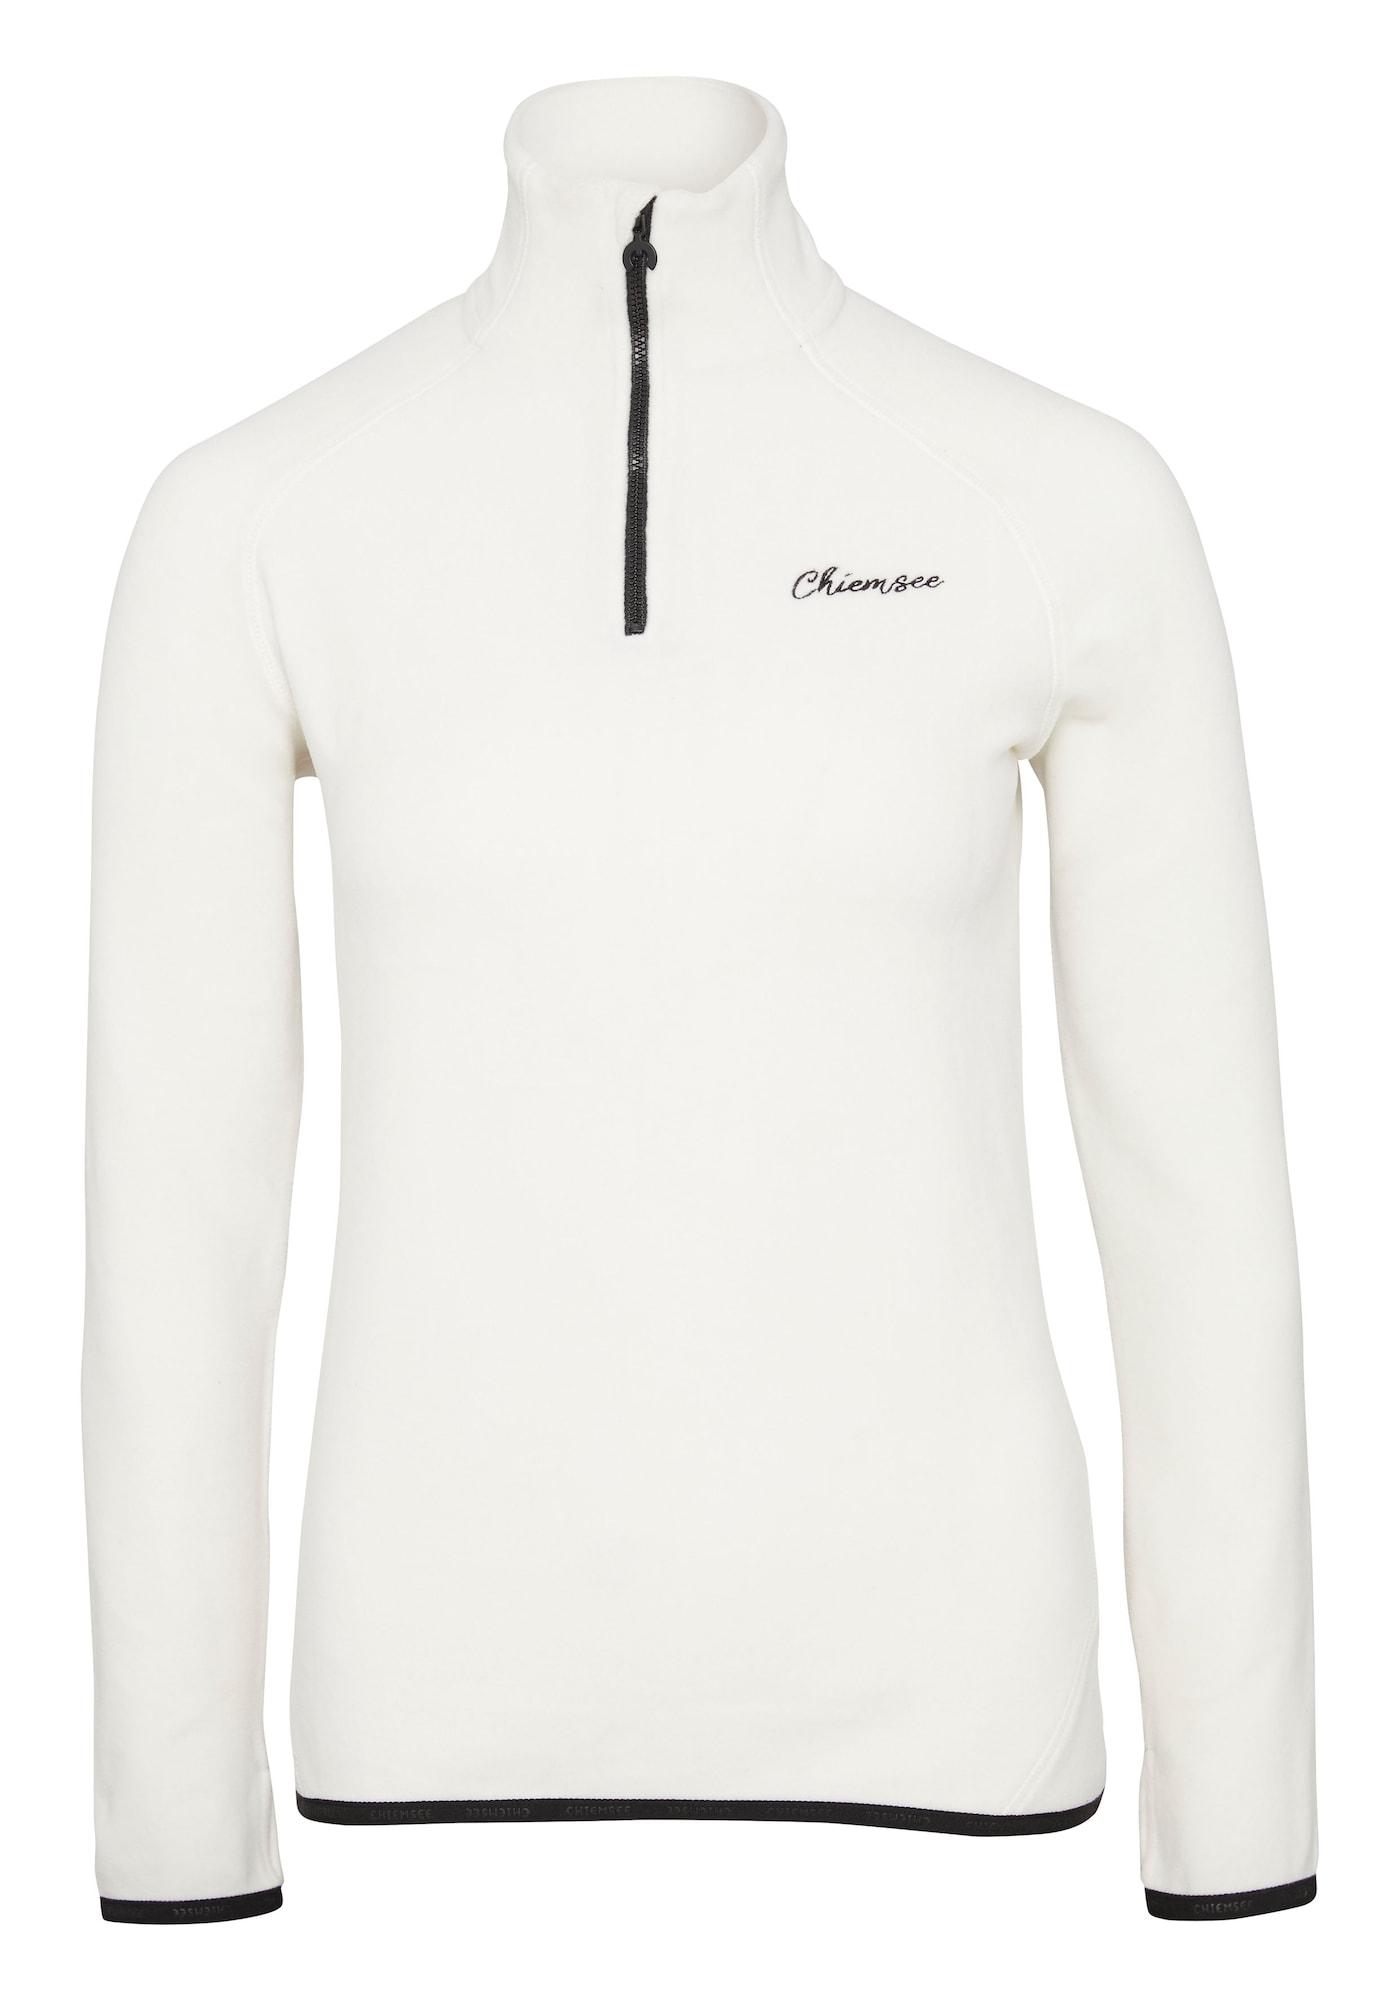 Fleeceshirt 'HEIKE Sweatshirt' | Bekleidung > Sweatshirts & -jacken > Fleeceshirts | Chiemsee